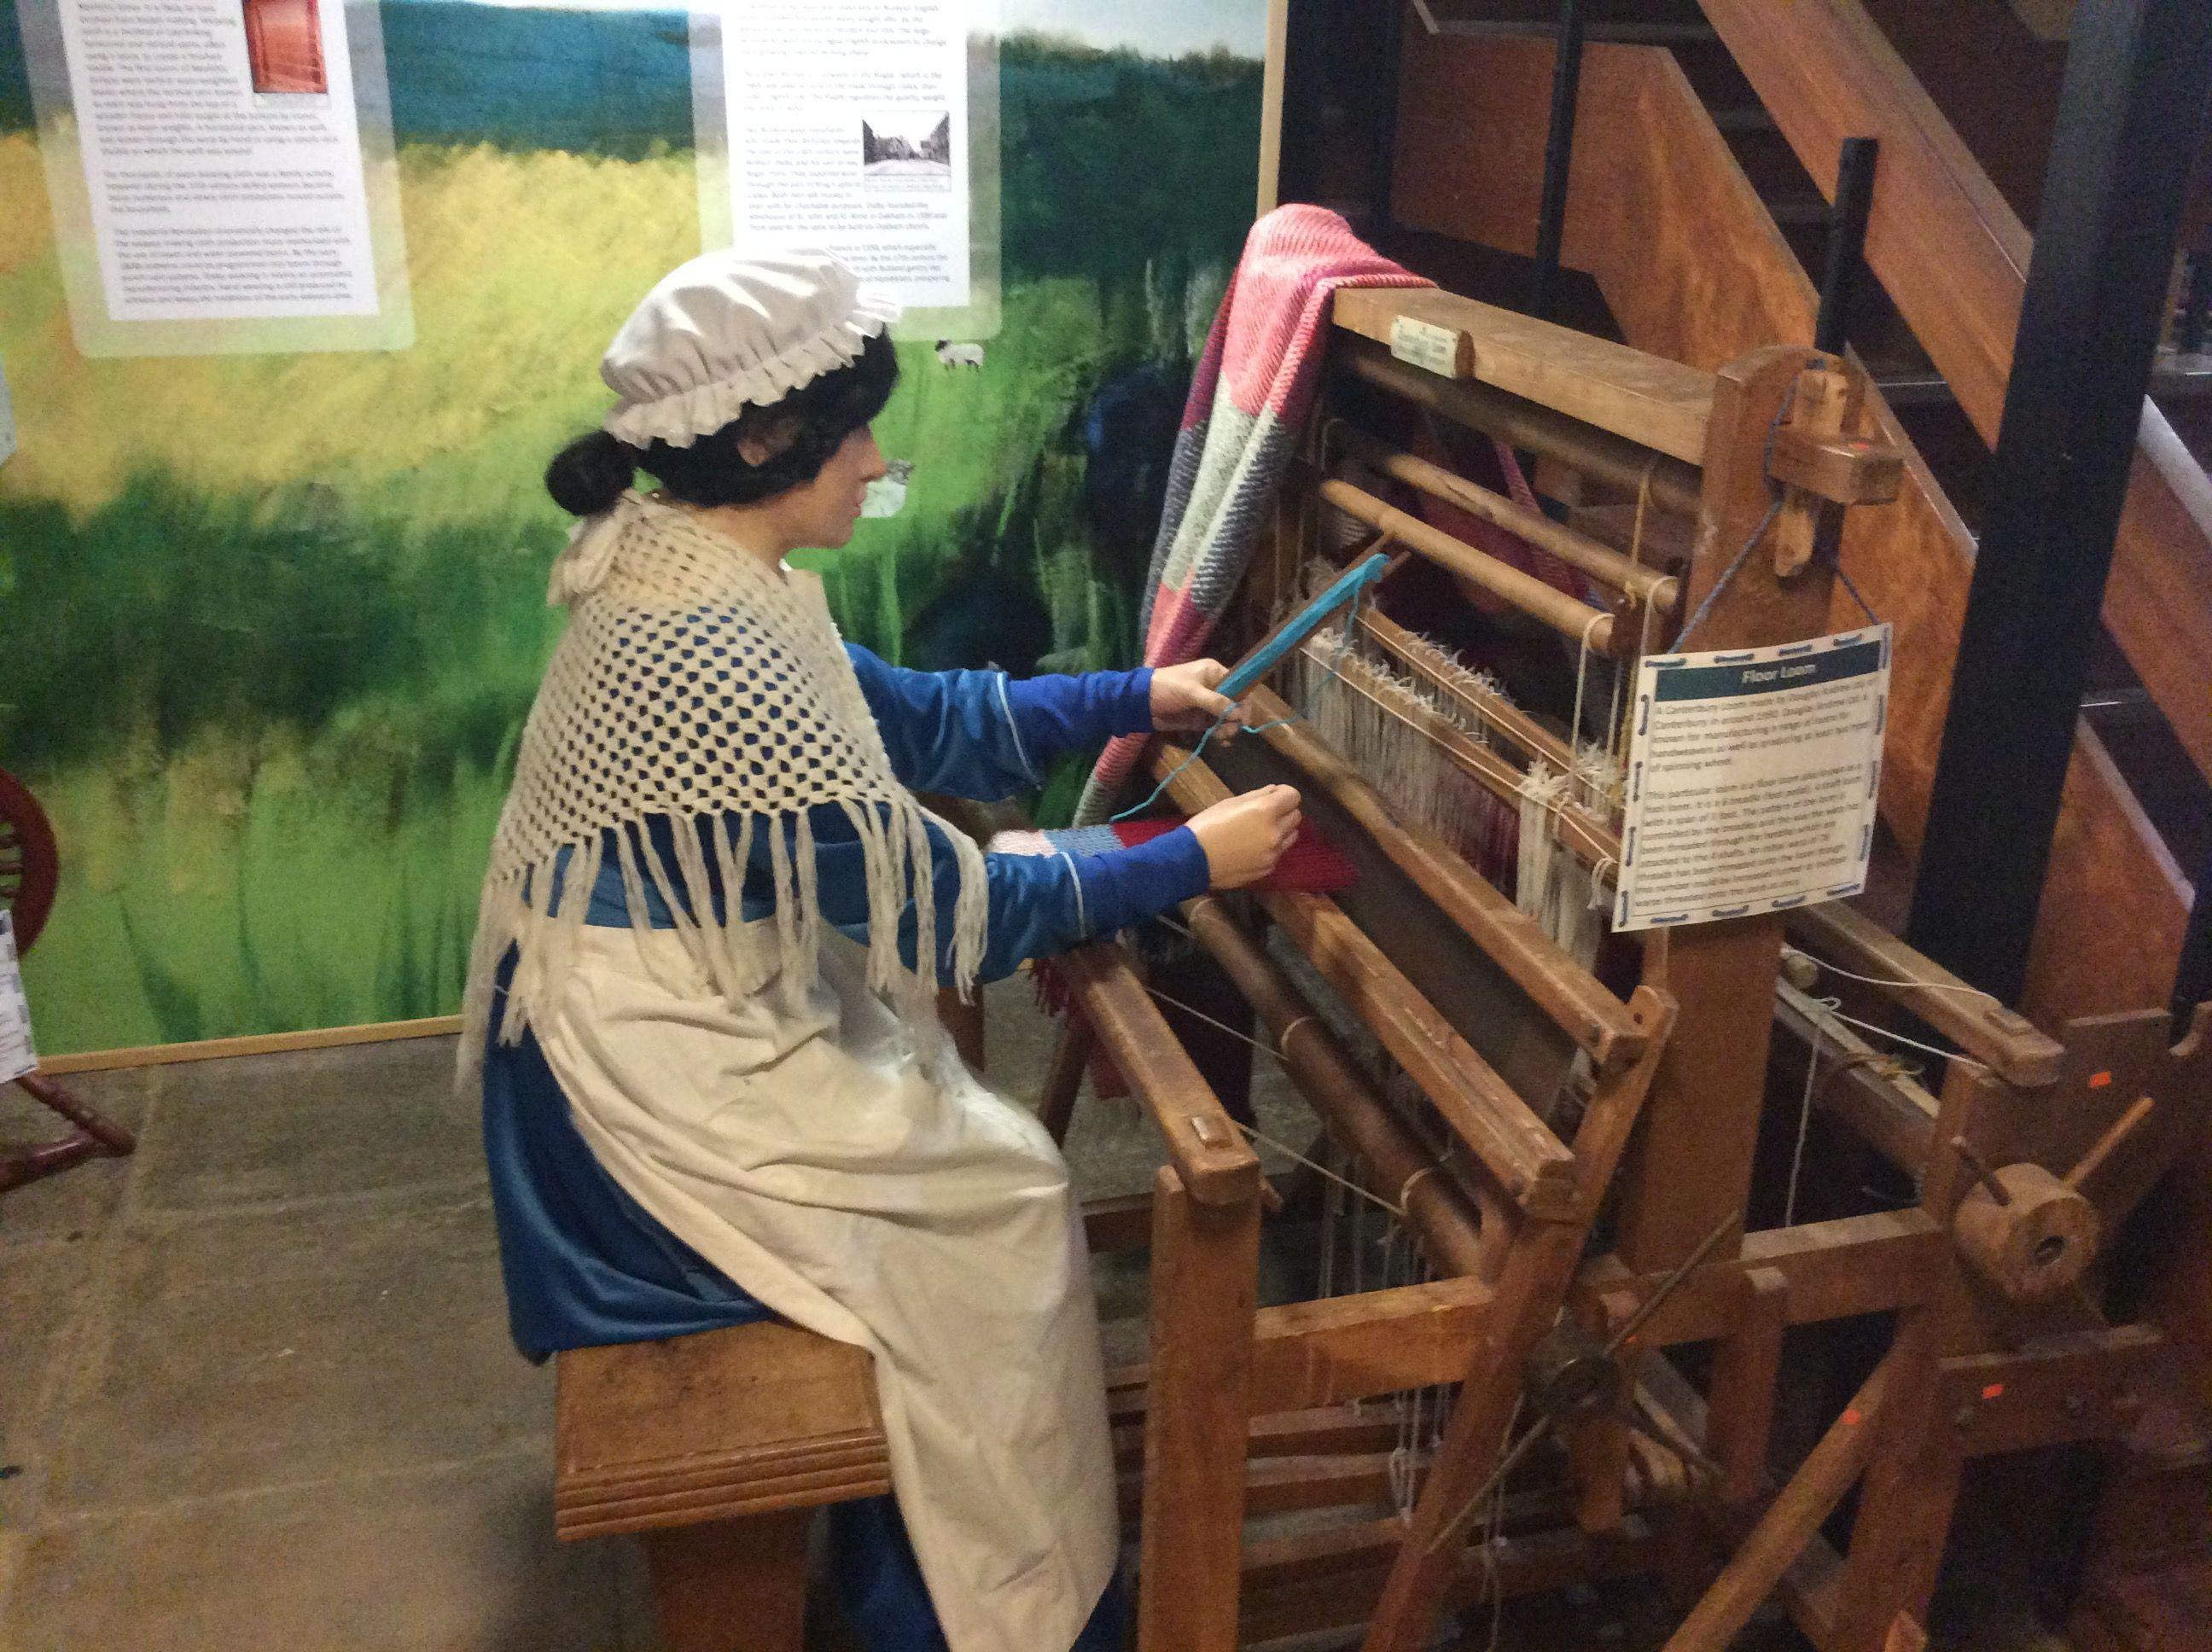 The Floor Loom exhibit at Rutland County Museum.